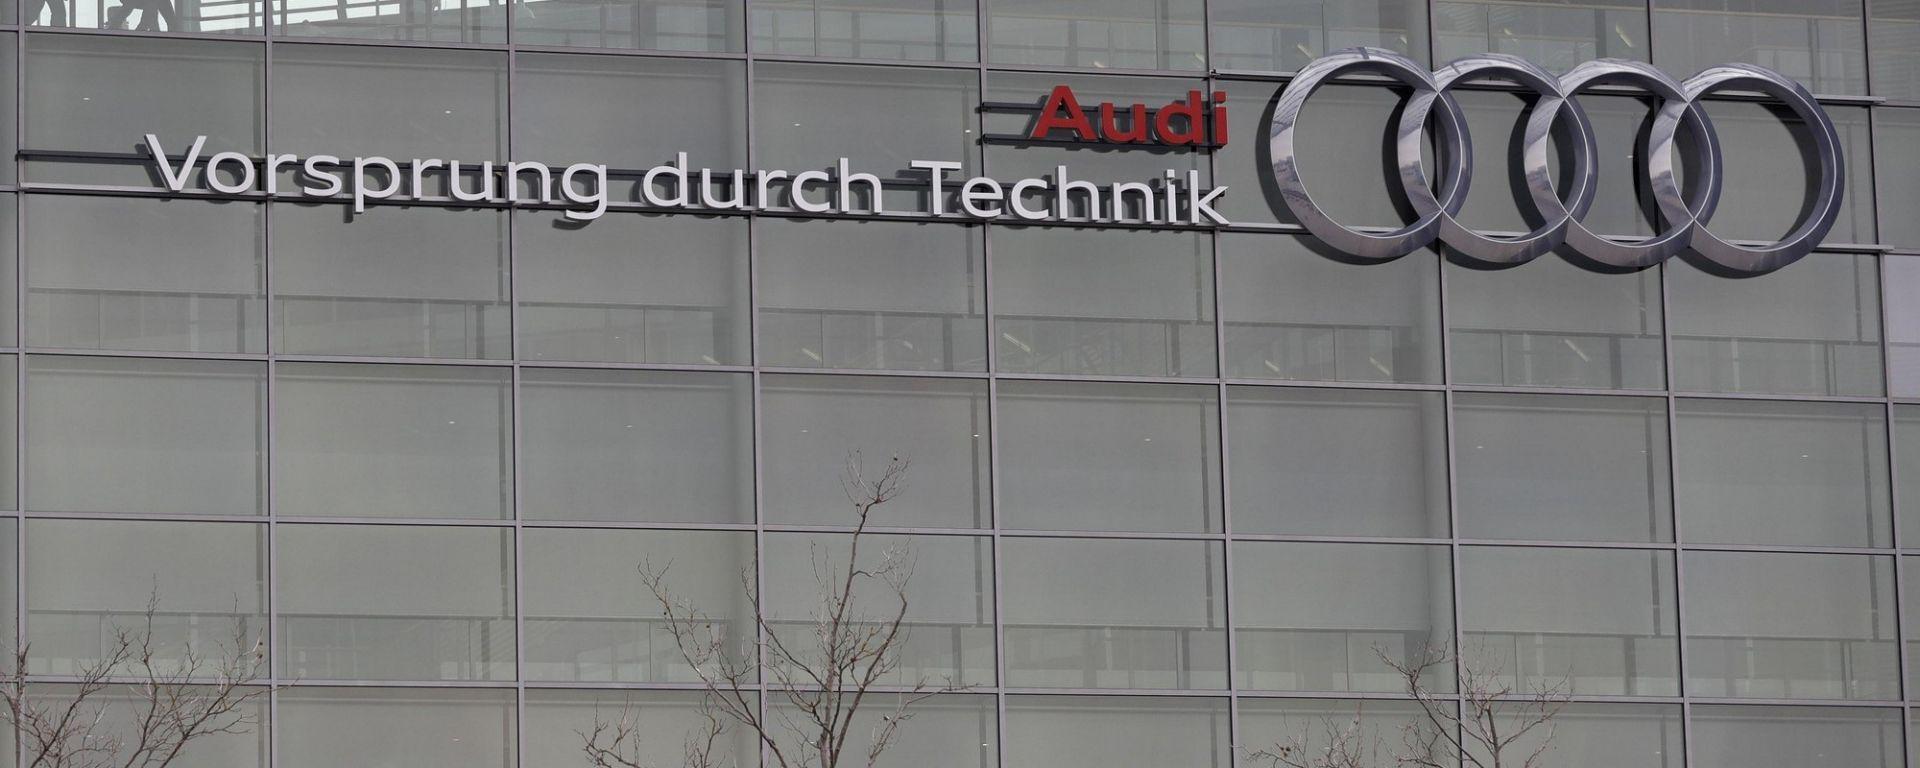 Audi, ancora grane collegate al dieselgate